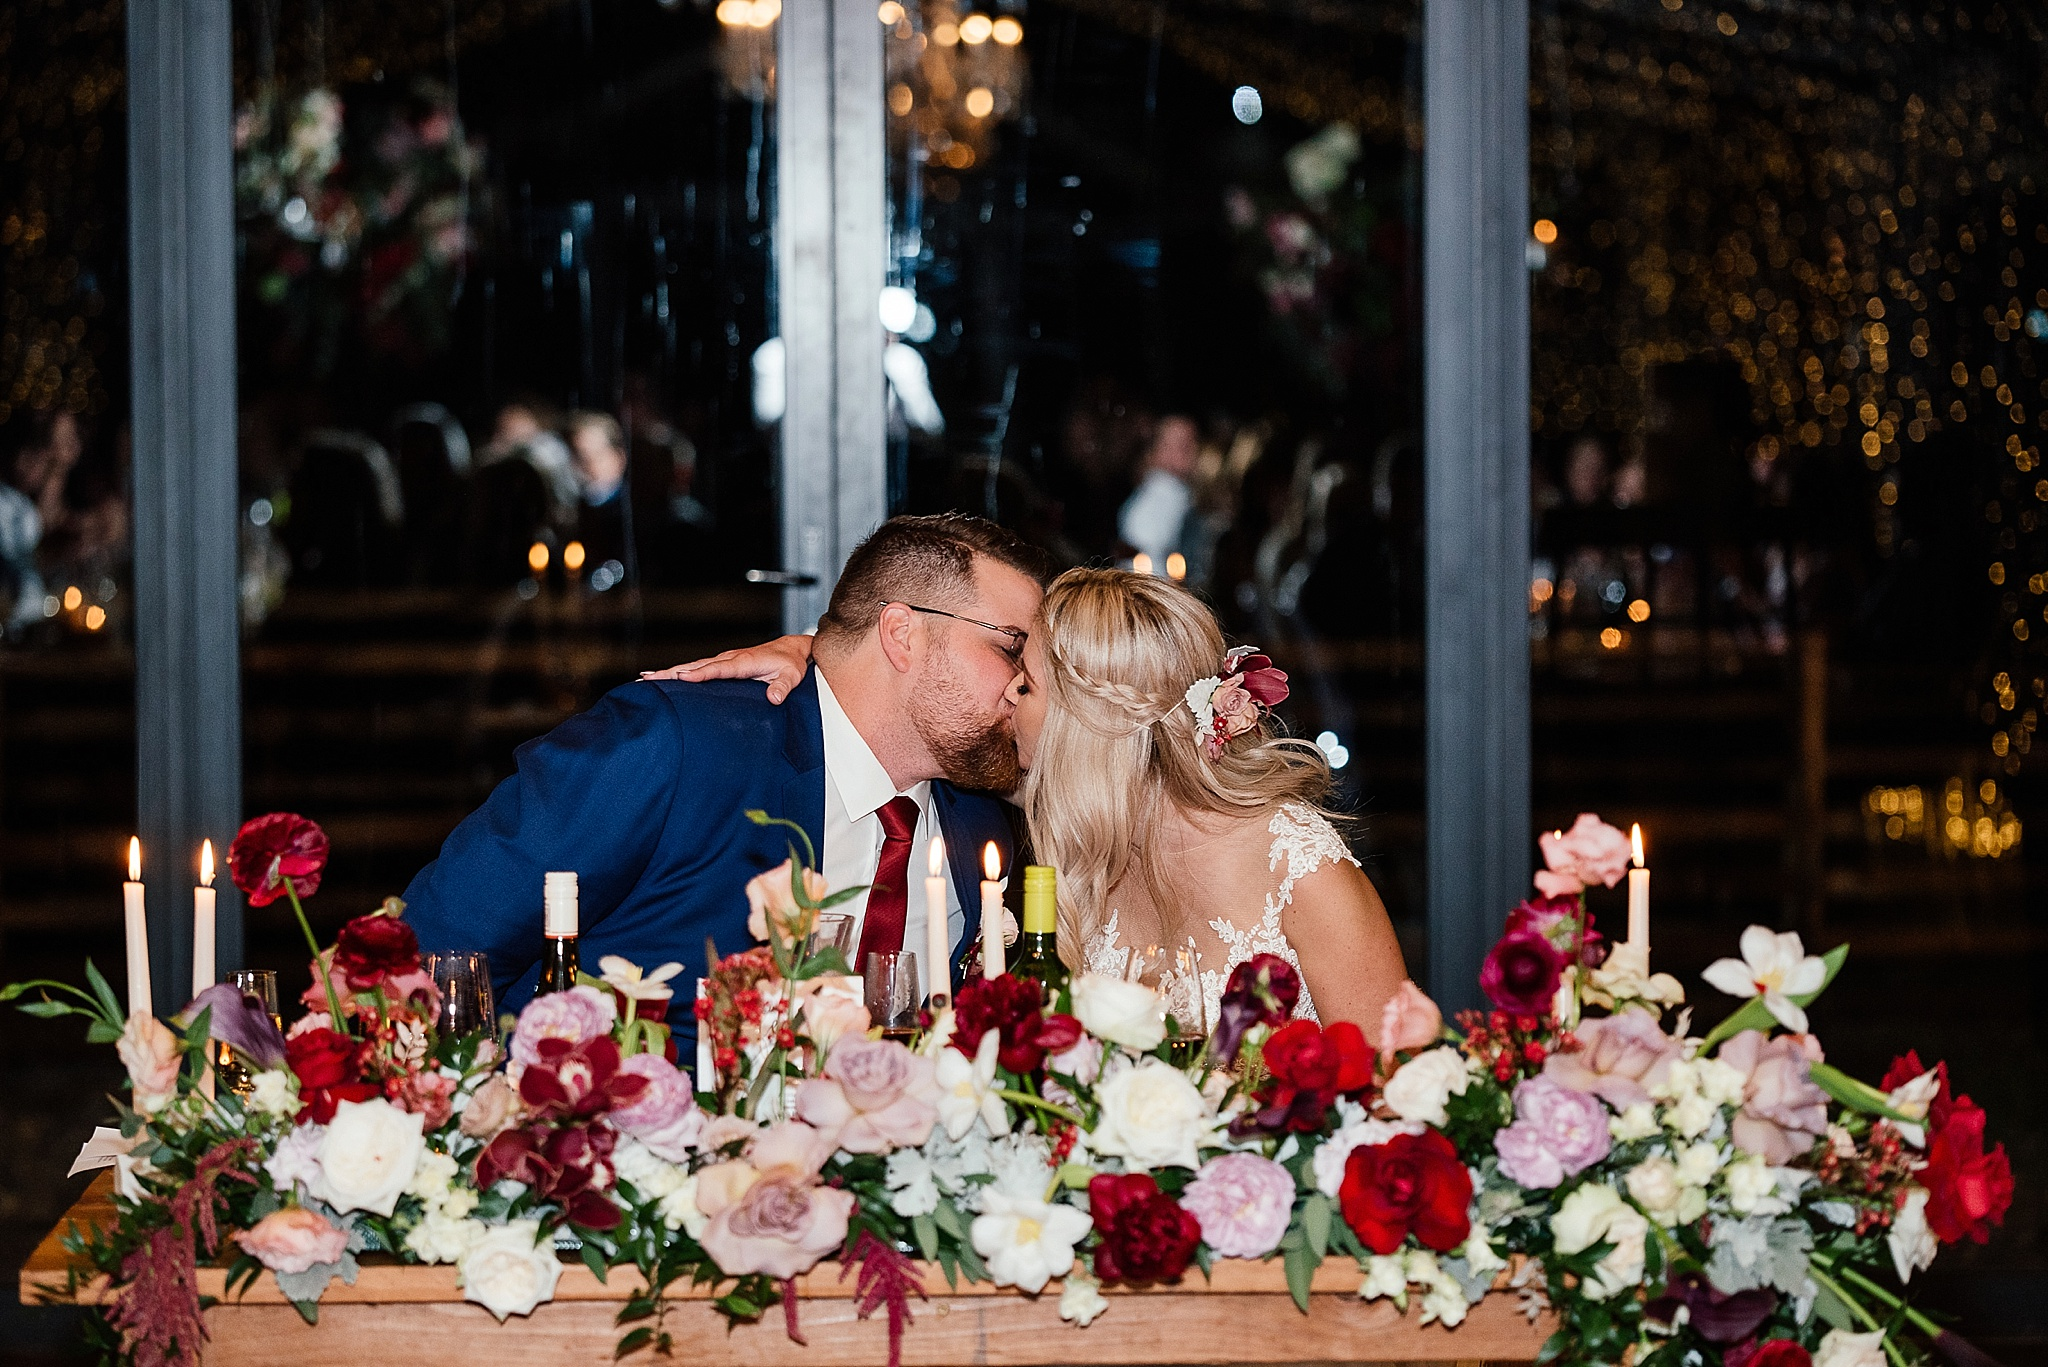 Cape Town Photographer Darren Bester - Die Woud Wedding - Gareth & Roxanne_0053.jpg